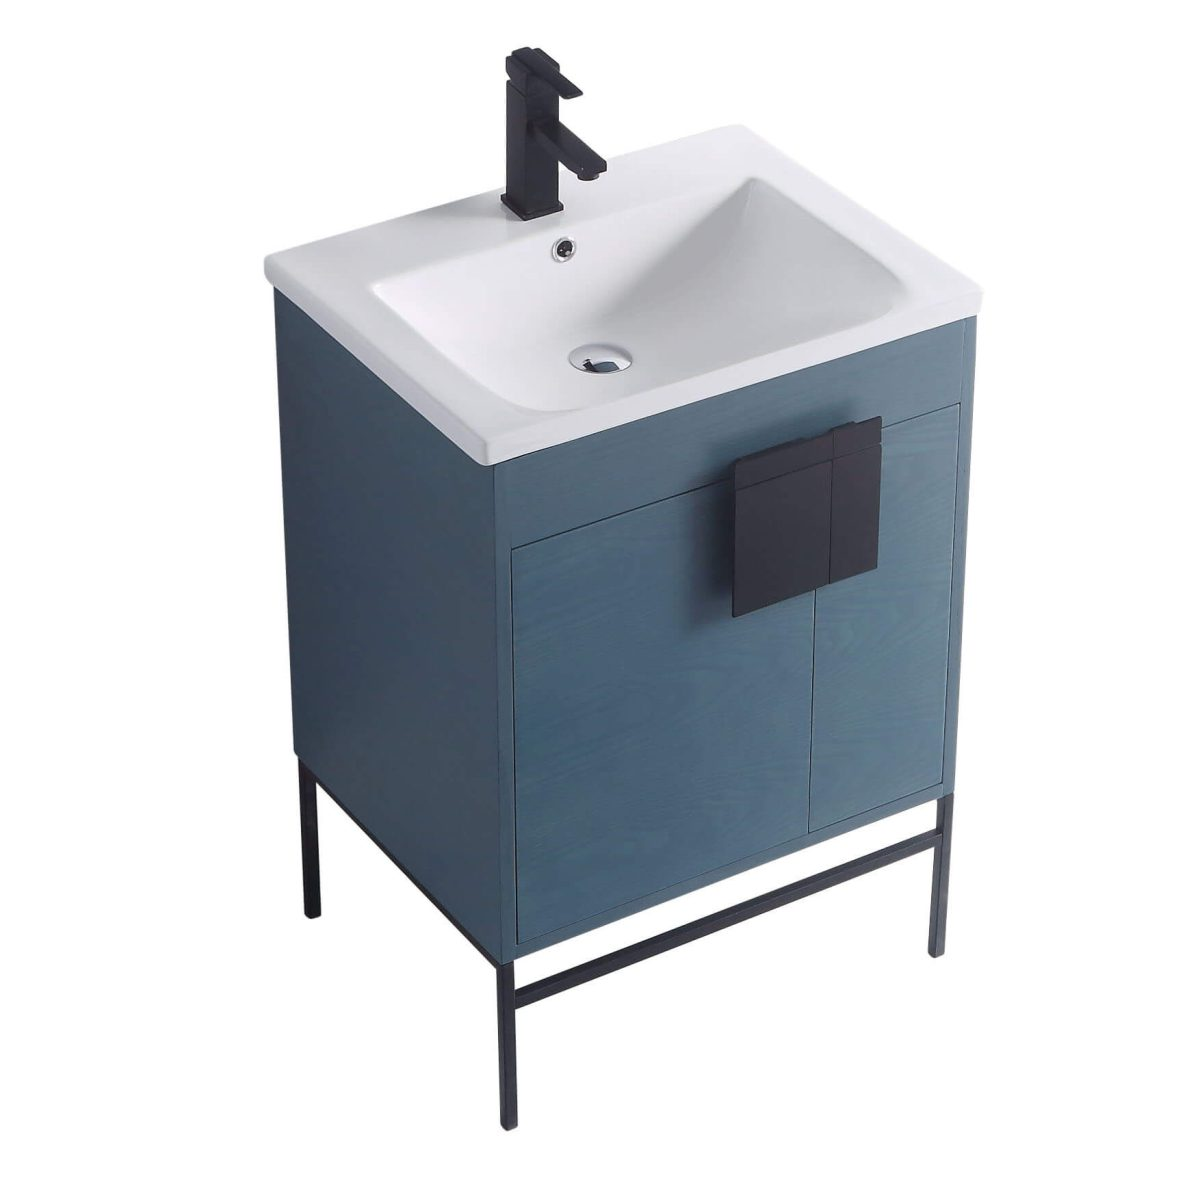 "Shawbridge 24"" Modern Bathroom Vanity  French Blue with Black Hardware"